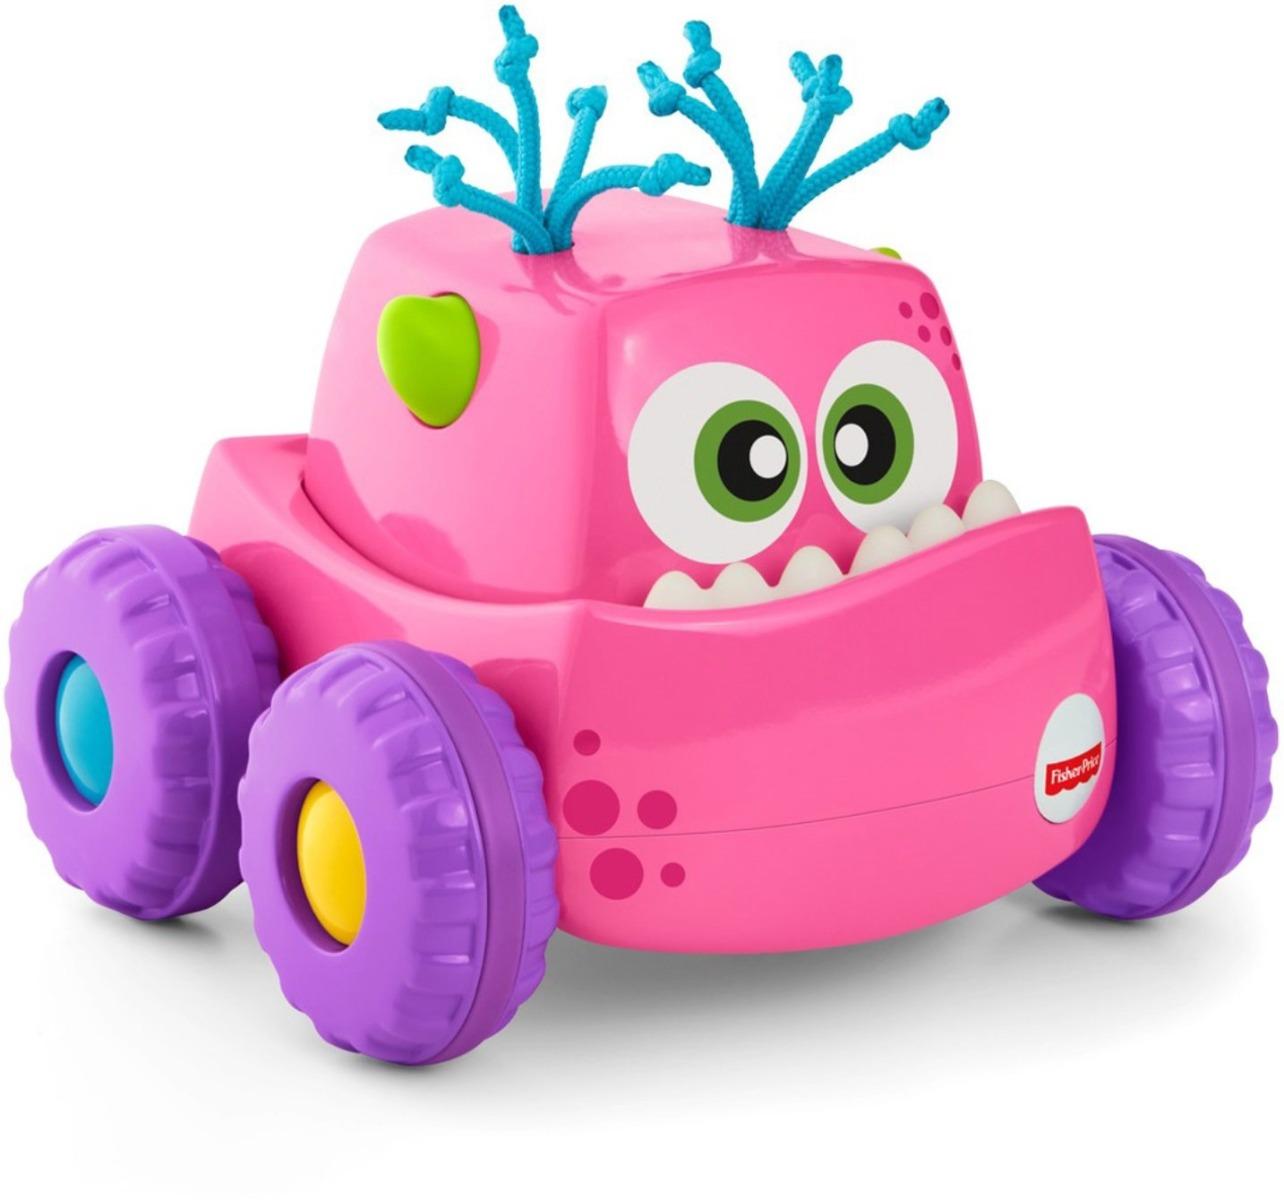 Jucarie pentru bebelusi masinuta monstrulet Fisher Price. Roz. DRG14